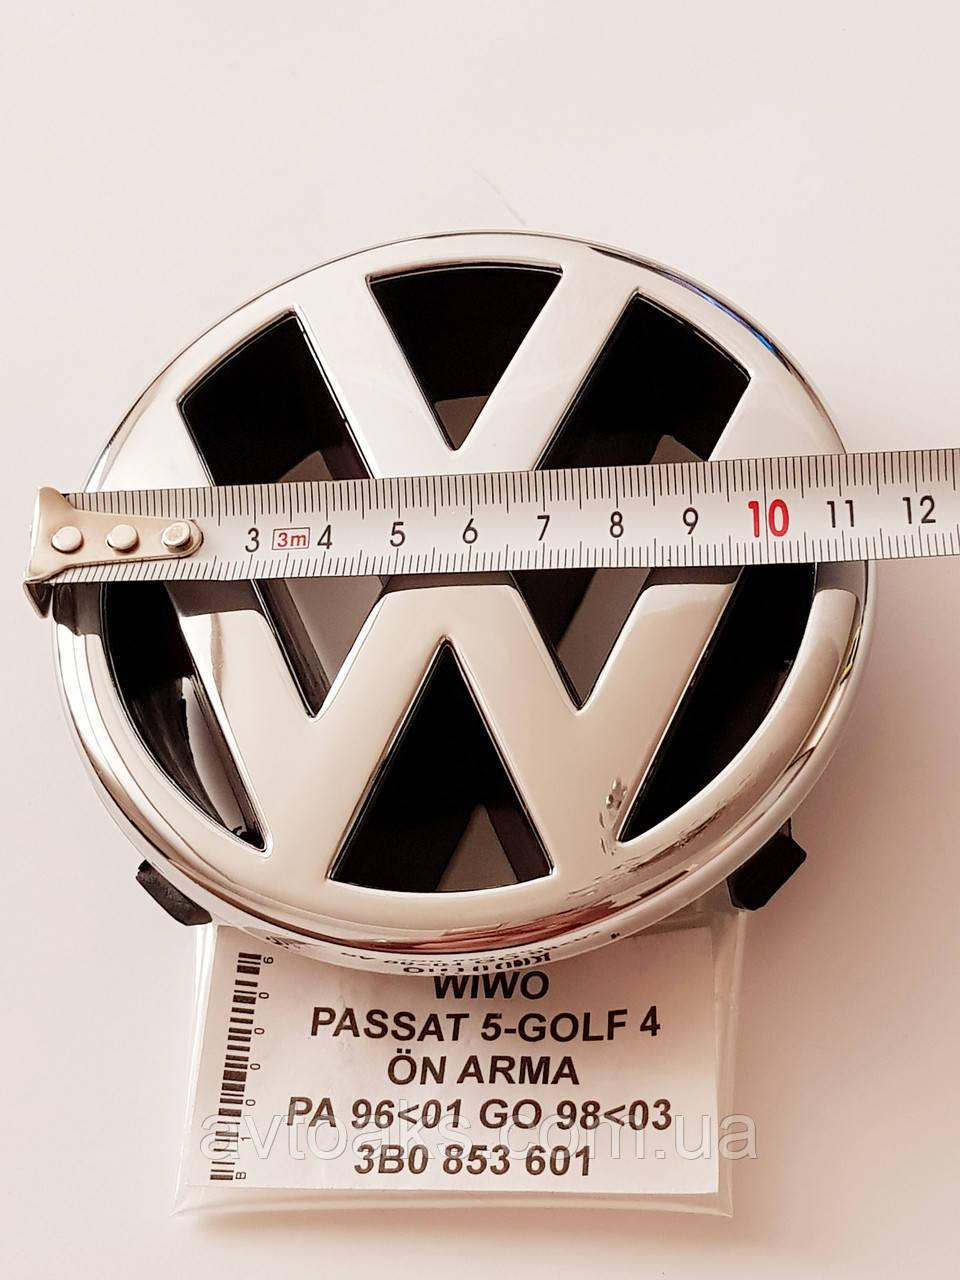 Эмблема Volkswagen Passat, Golf, диаметр 115 мм.